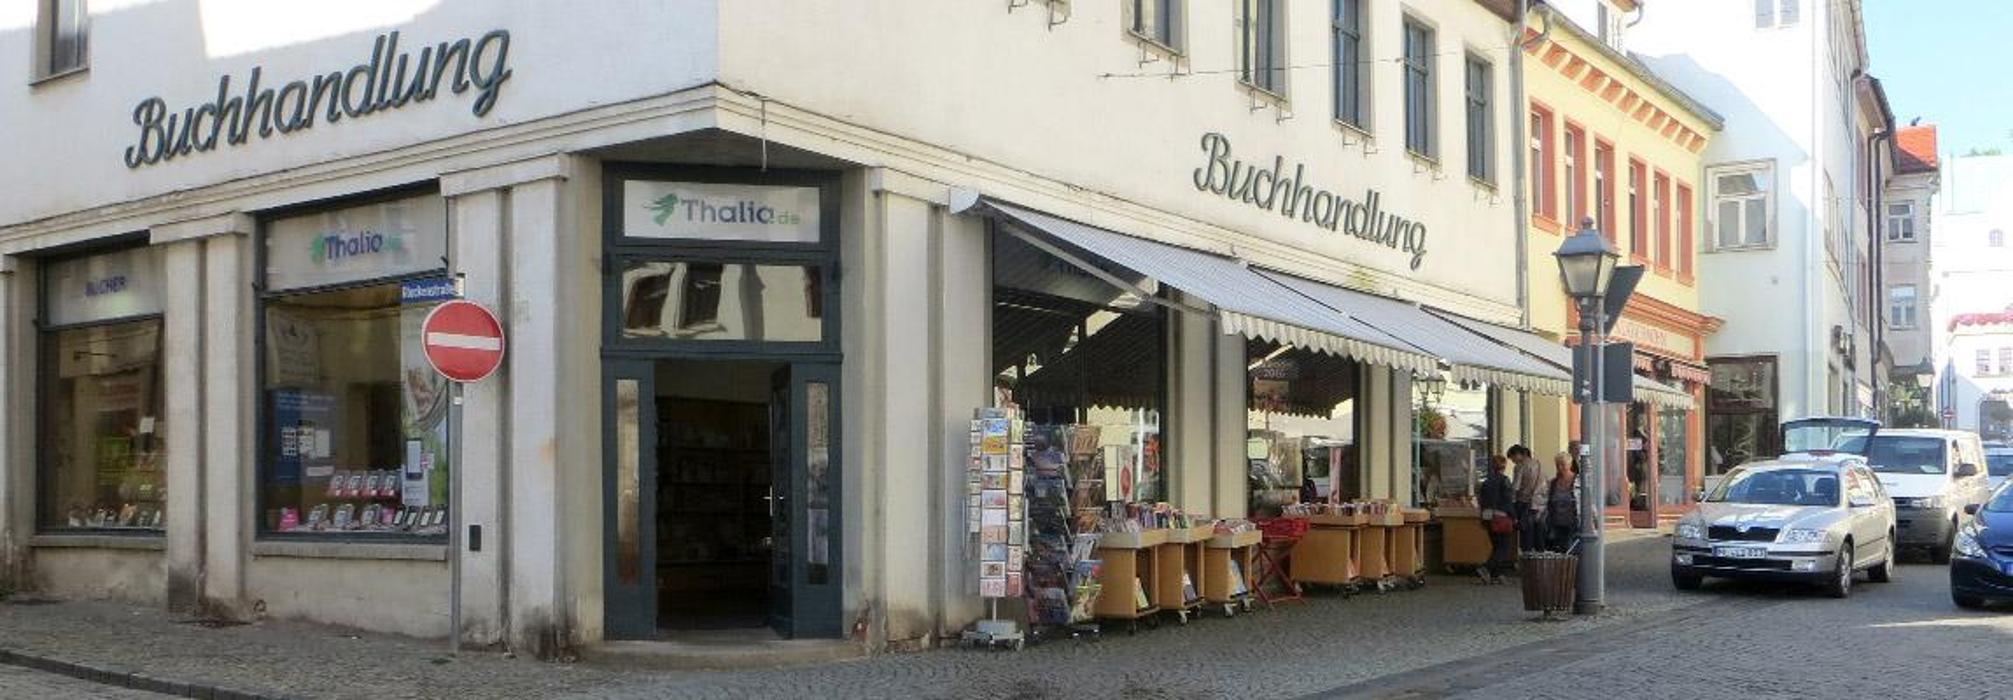 Thalia Lutherstadt Eisleben • Lutherstadt Eisleben Markt